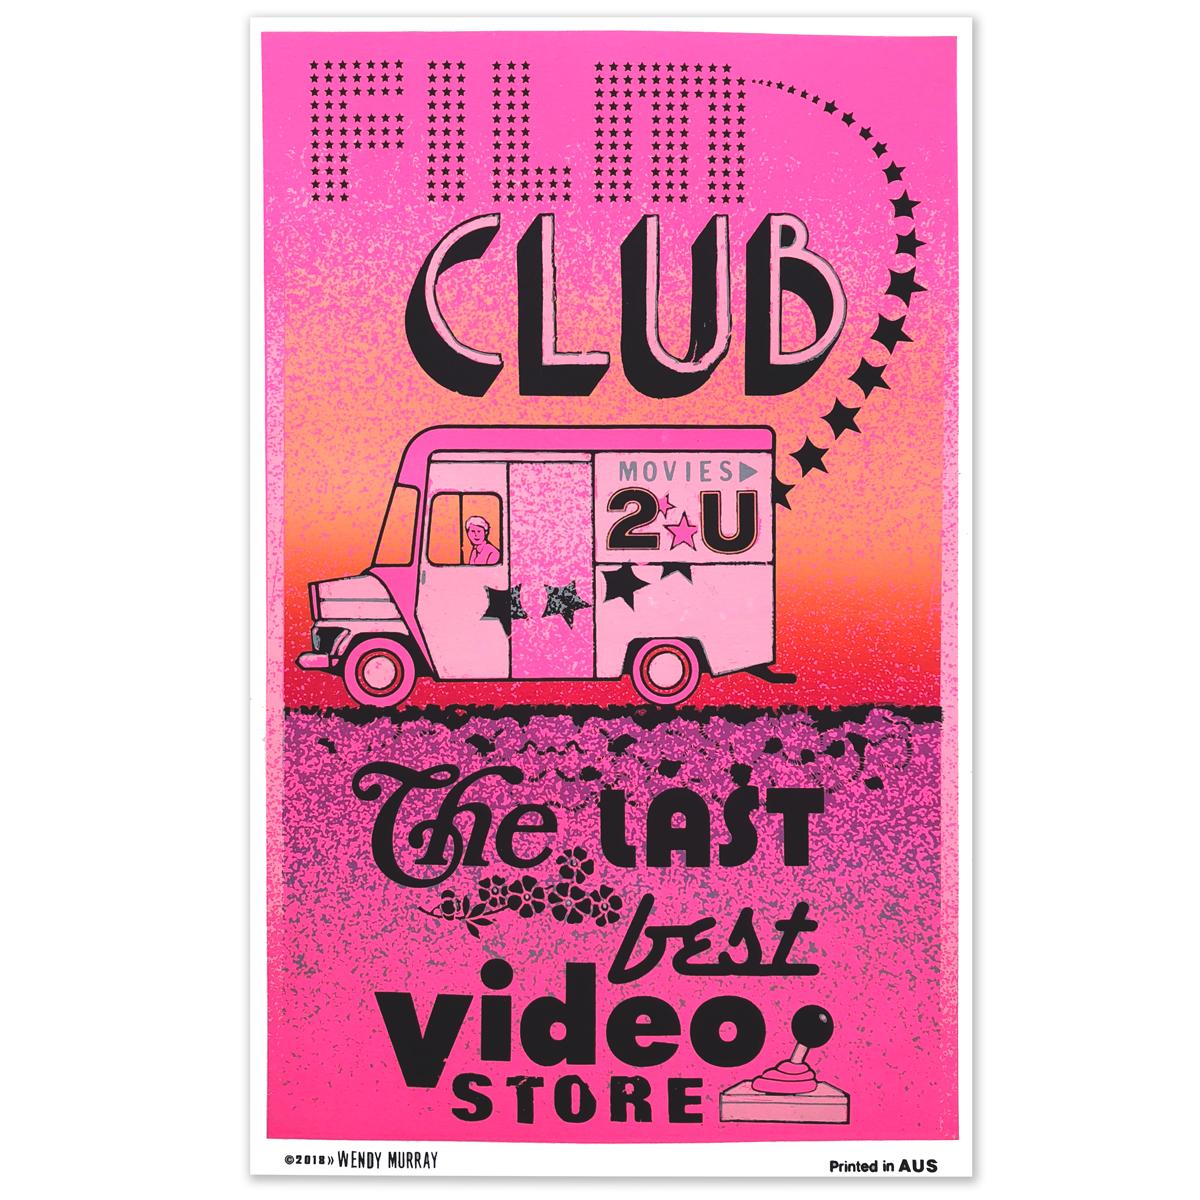 Film_Club_instagram.jpg